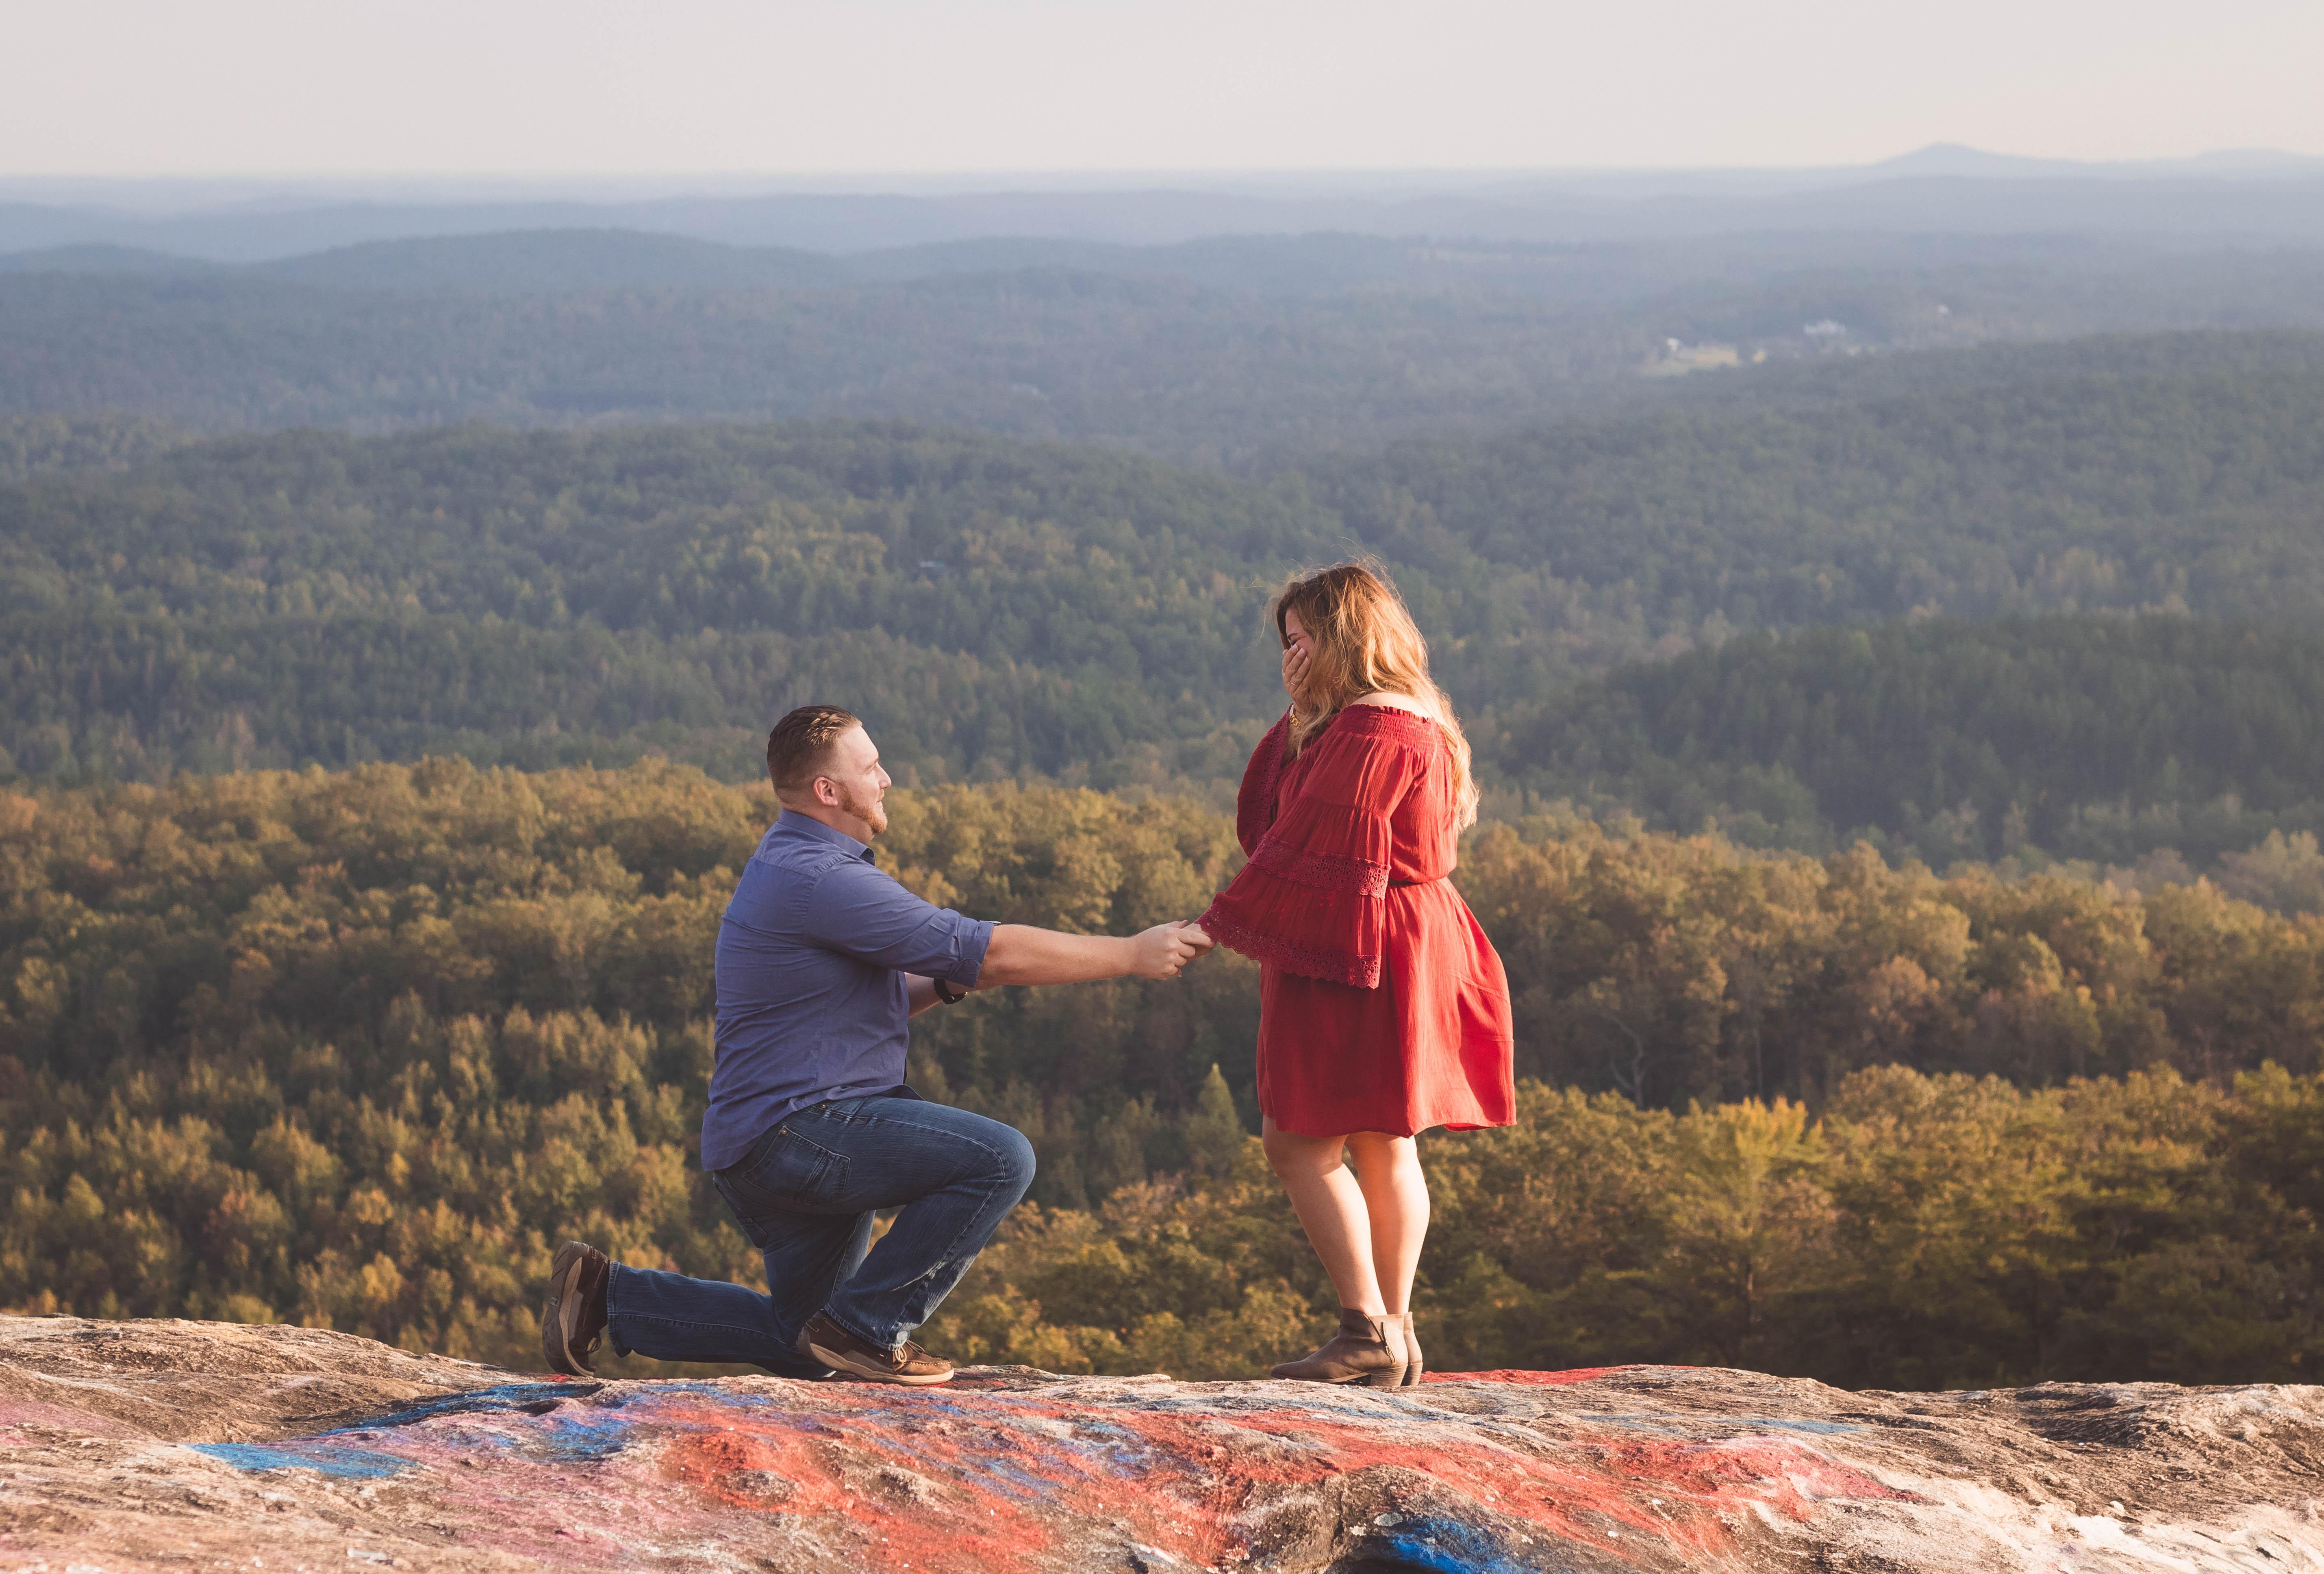 Wedding Proposal Ideas in Greenville, South Carolina